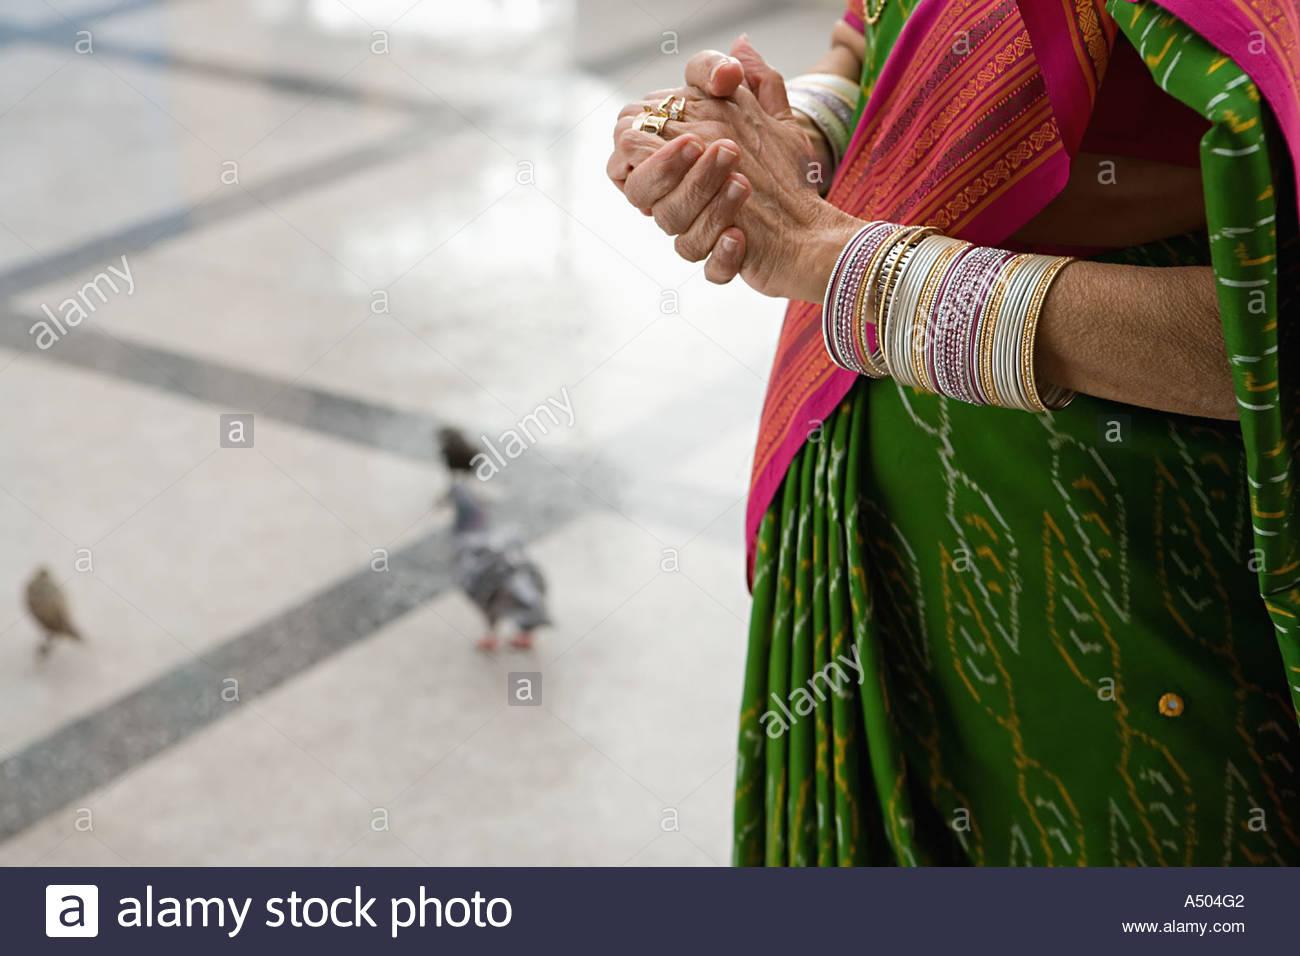 Woman in sari near pigeons - Stock Image